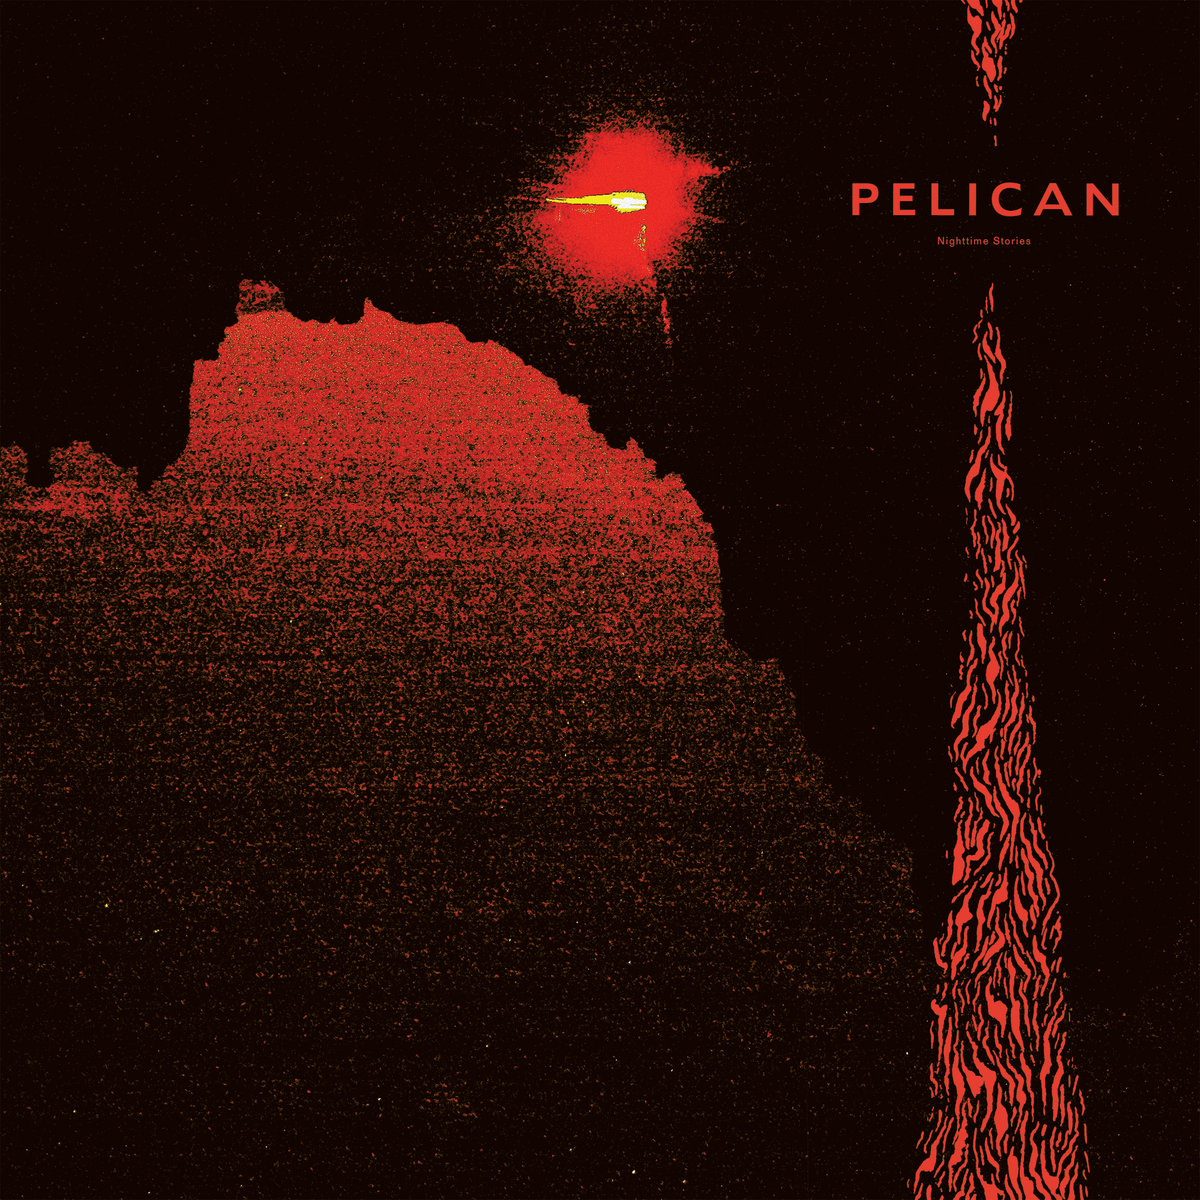 Pelican - Nighttime Stories LP